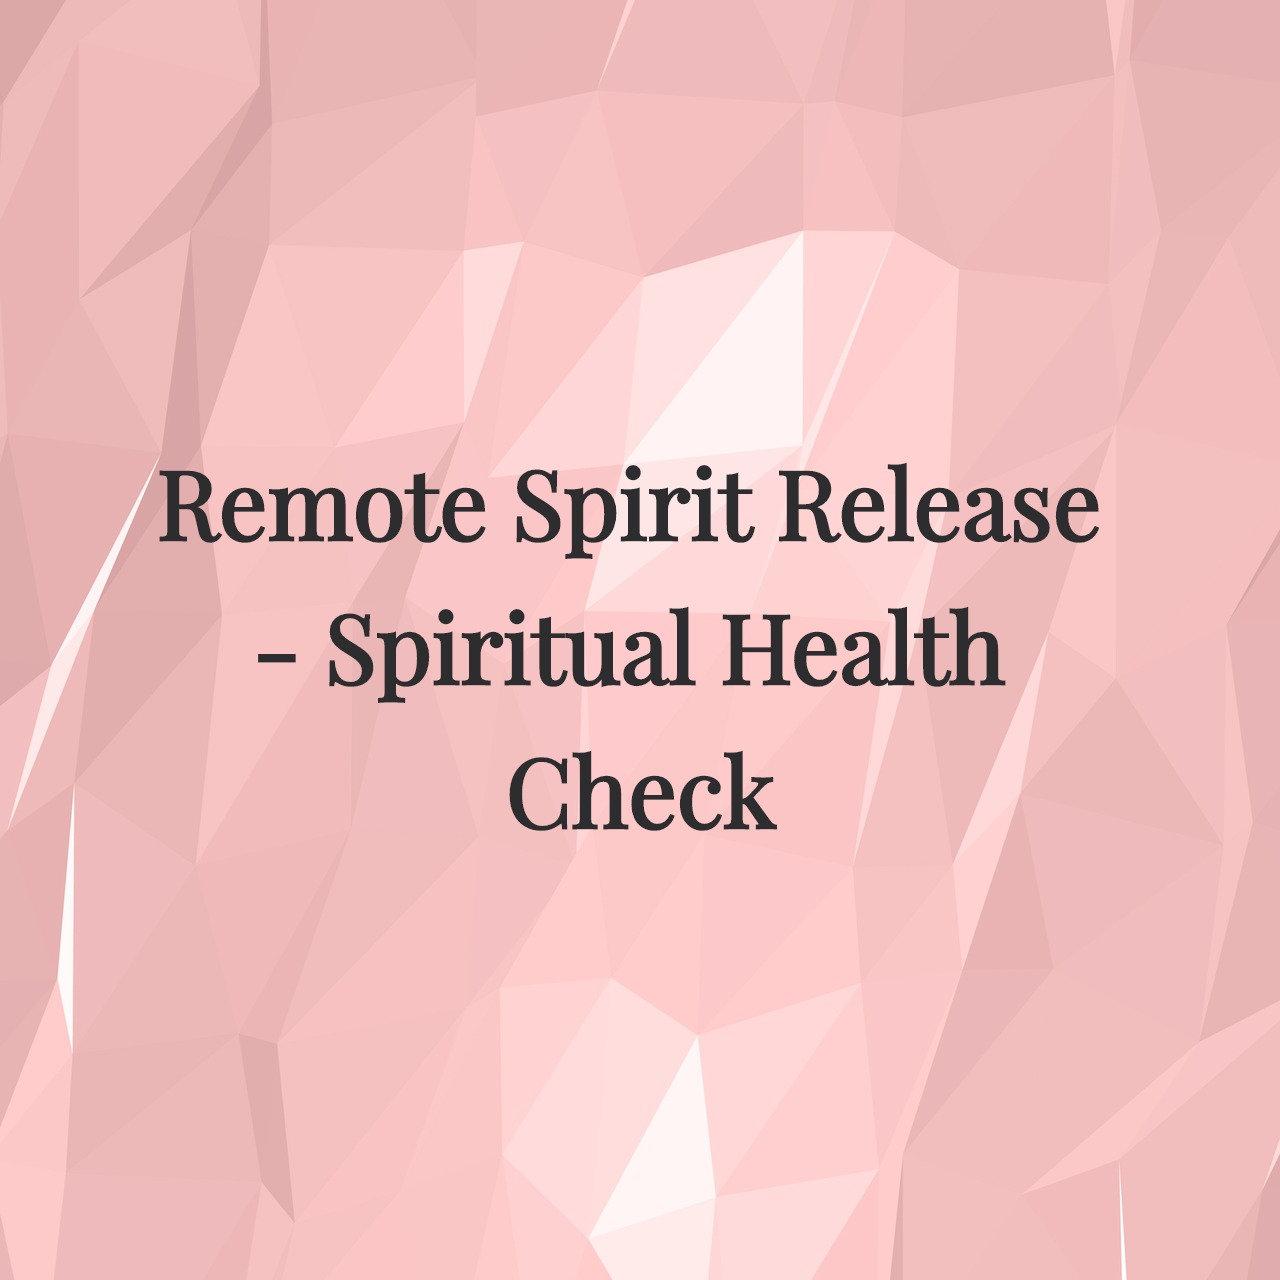 RSR - Spiritual Health Check